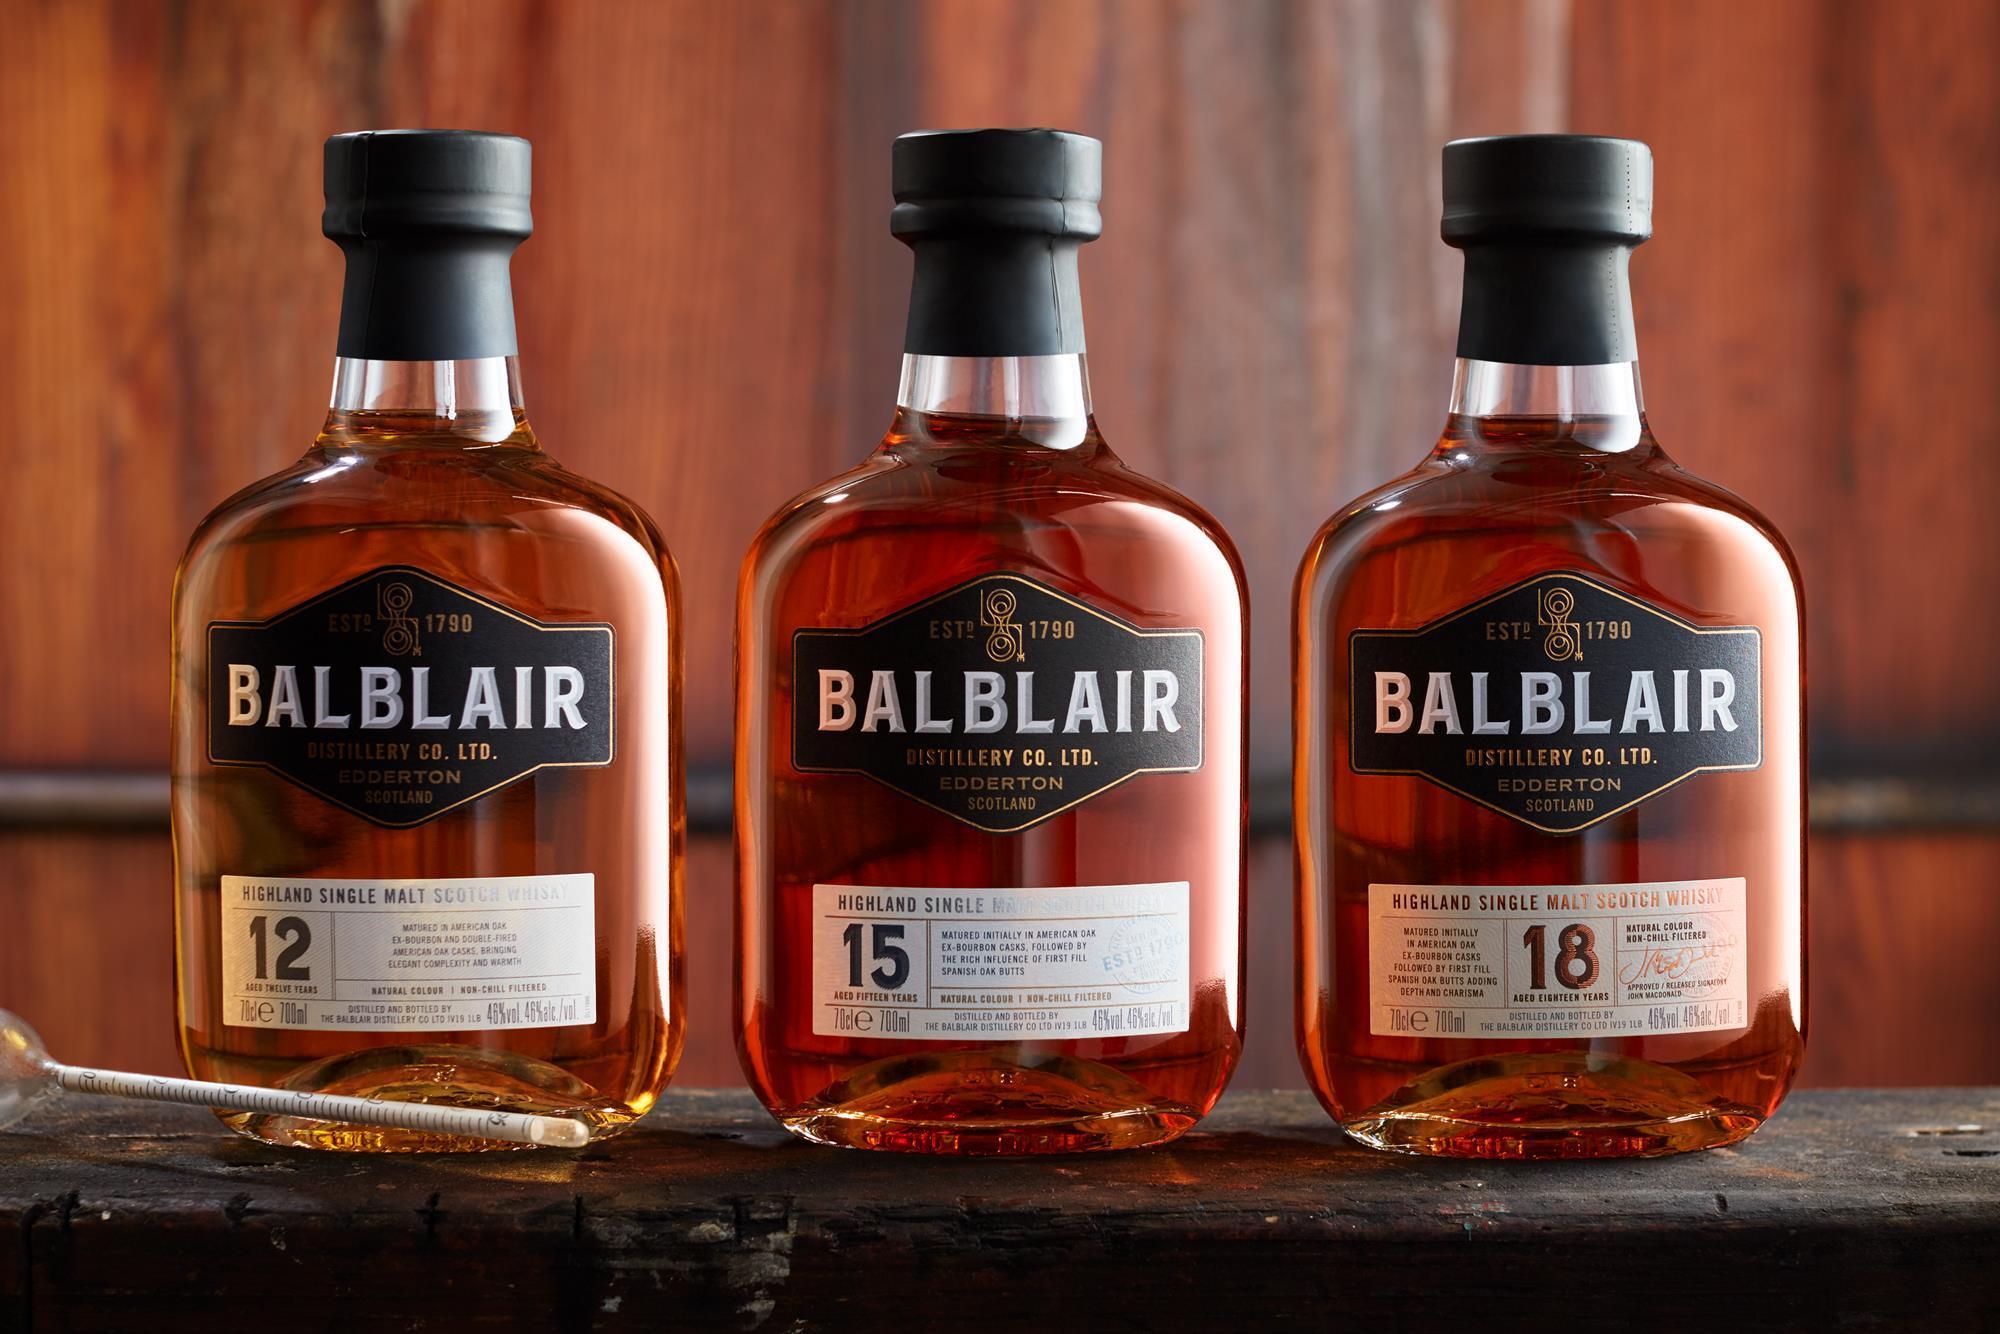 Balblair's New Core Range: Balblair 12 (46%), Balblair 15 (46%), Balblair 18 (46%)